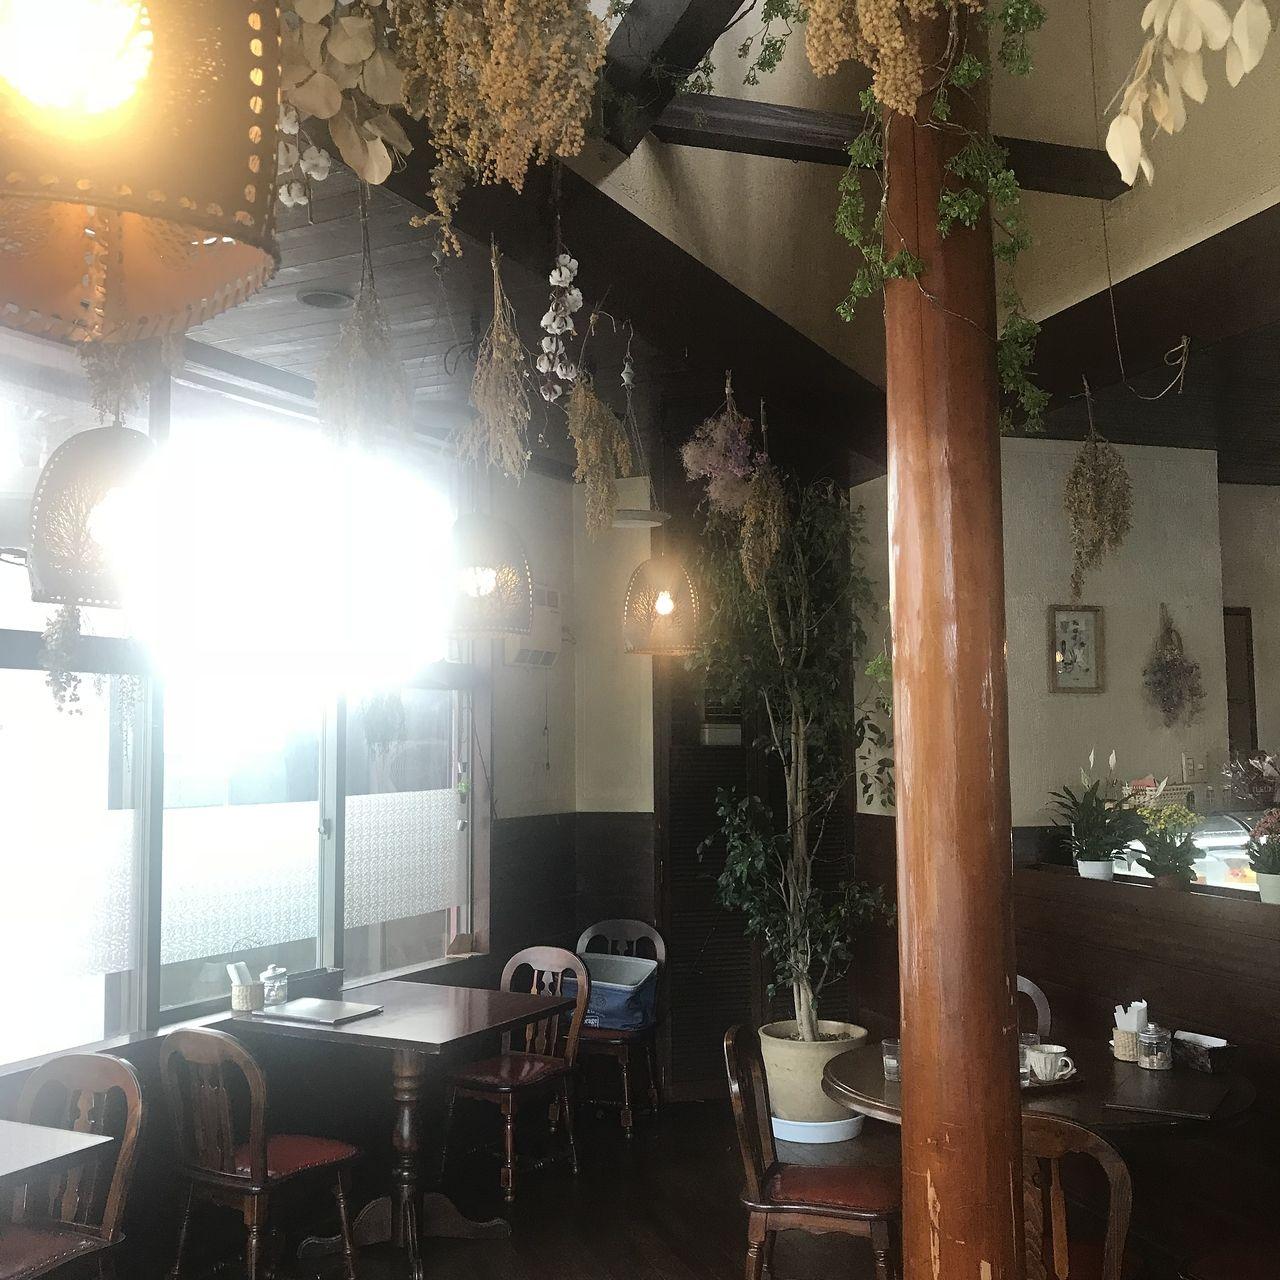 Flowerカフェひまつぶしの店内はとてもチャーミング